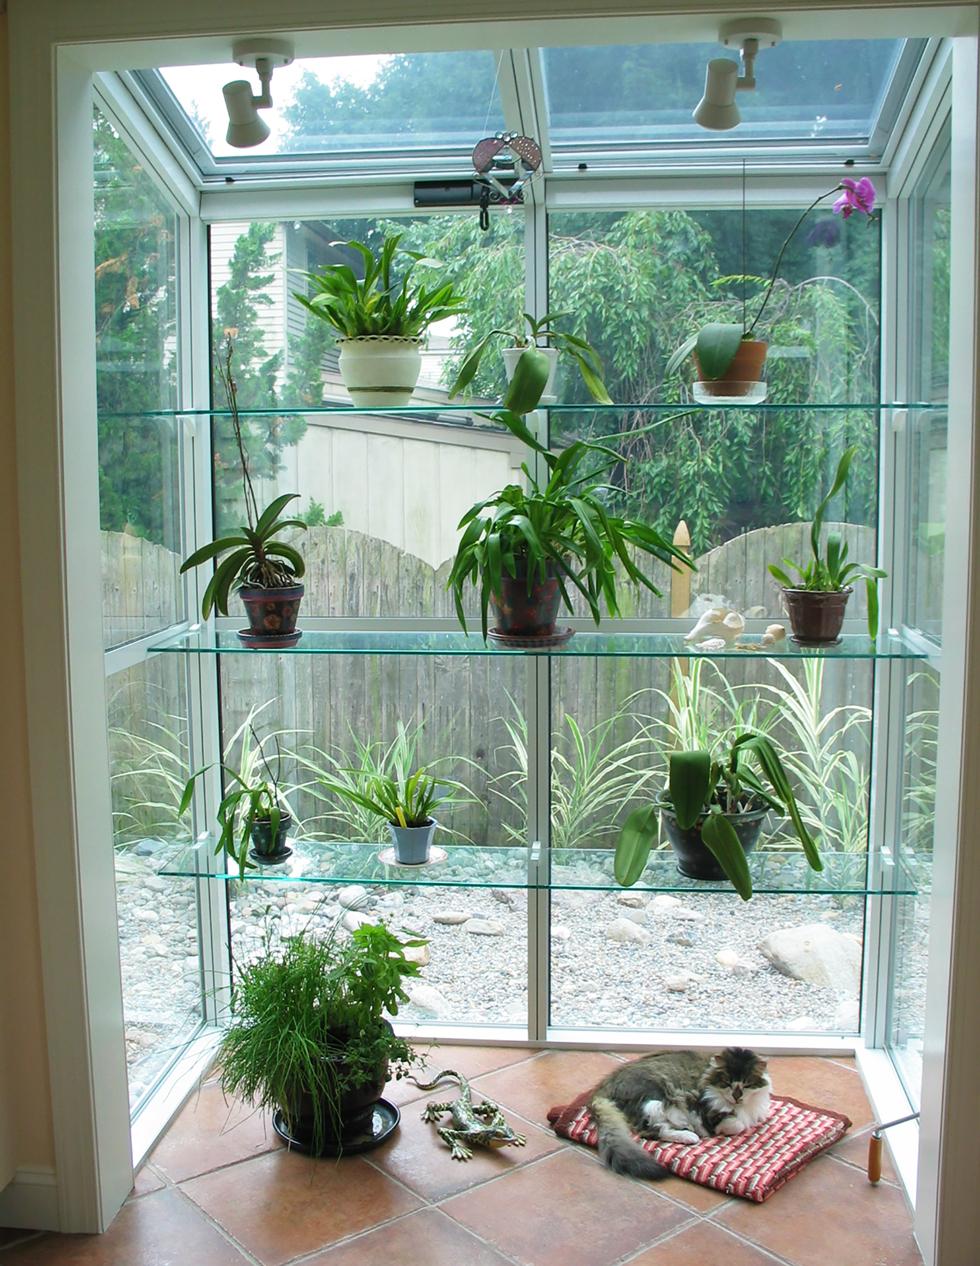 Window Shelves At Diyshowoff Window Succulents · Shelf Storage Ideas Over  The Door Storage Creative Storage Solutions ...